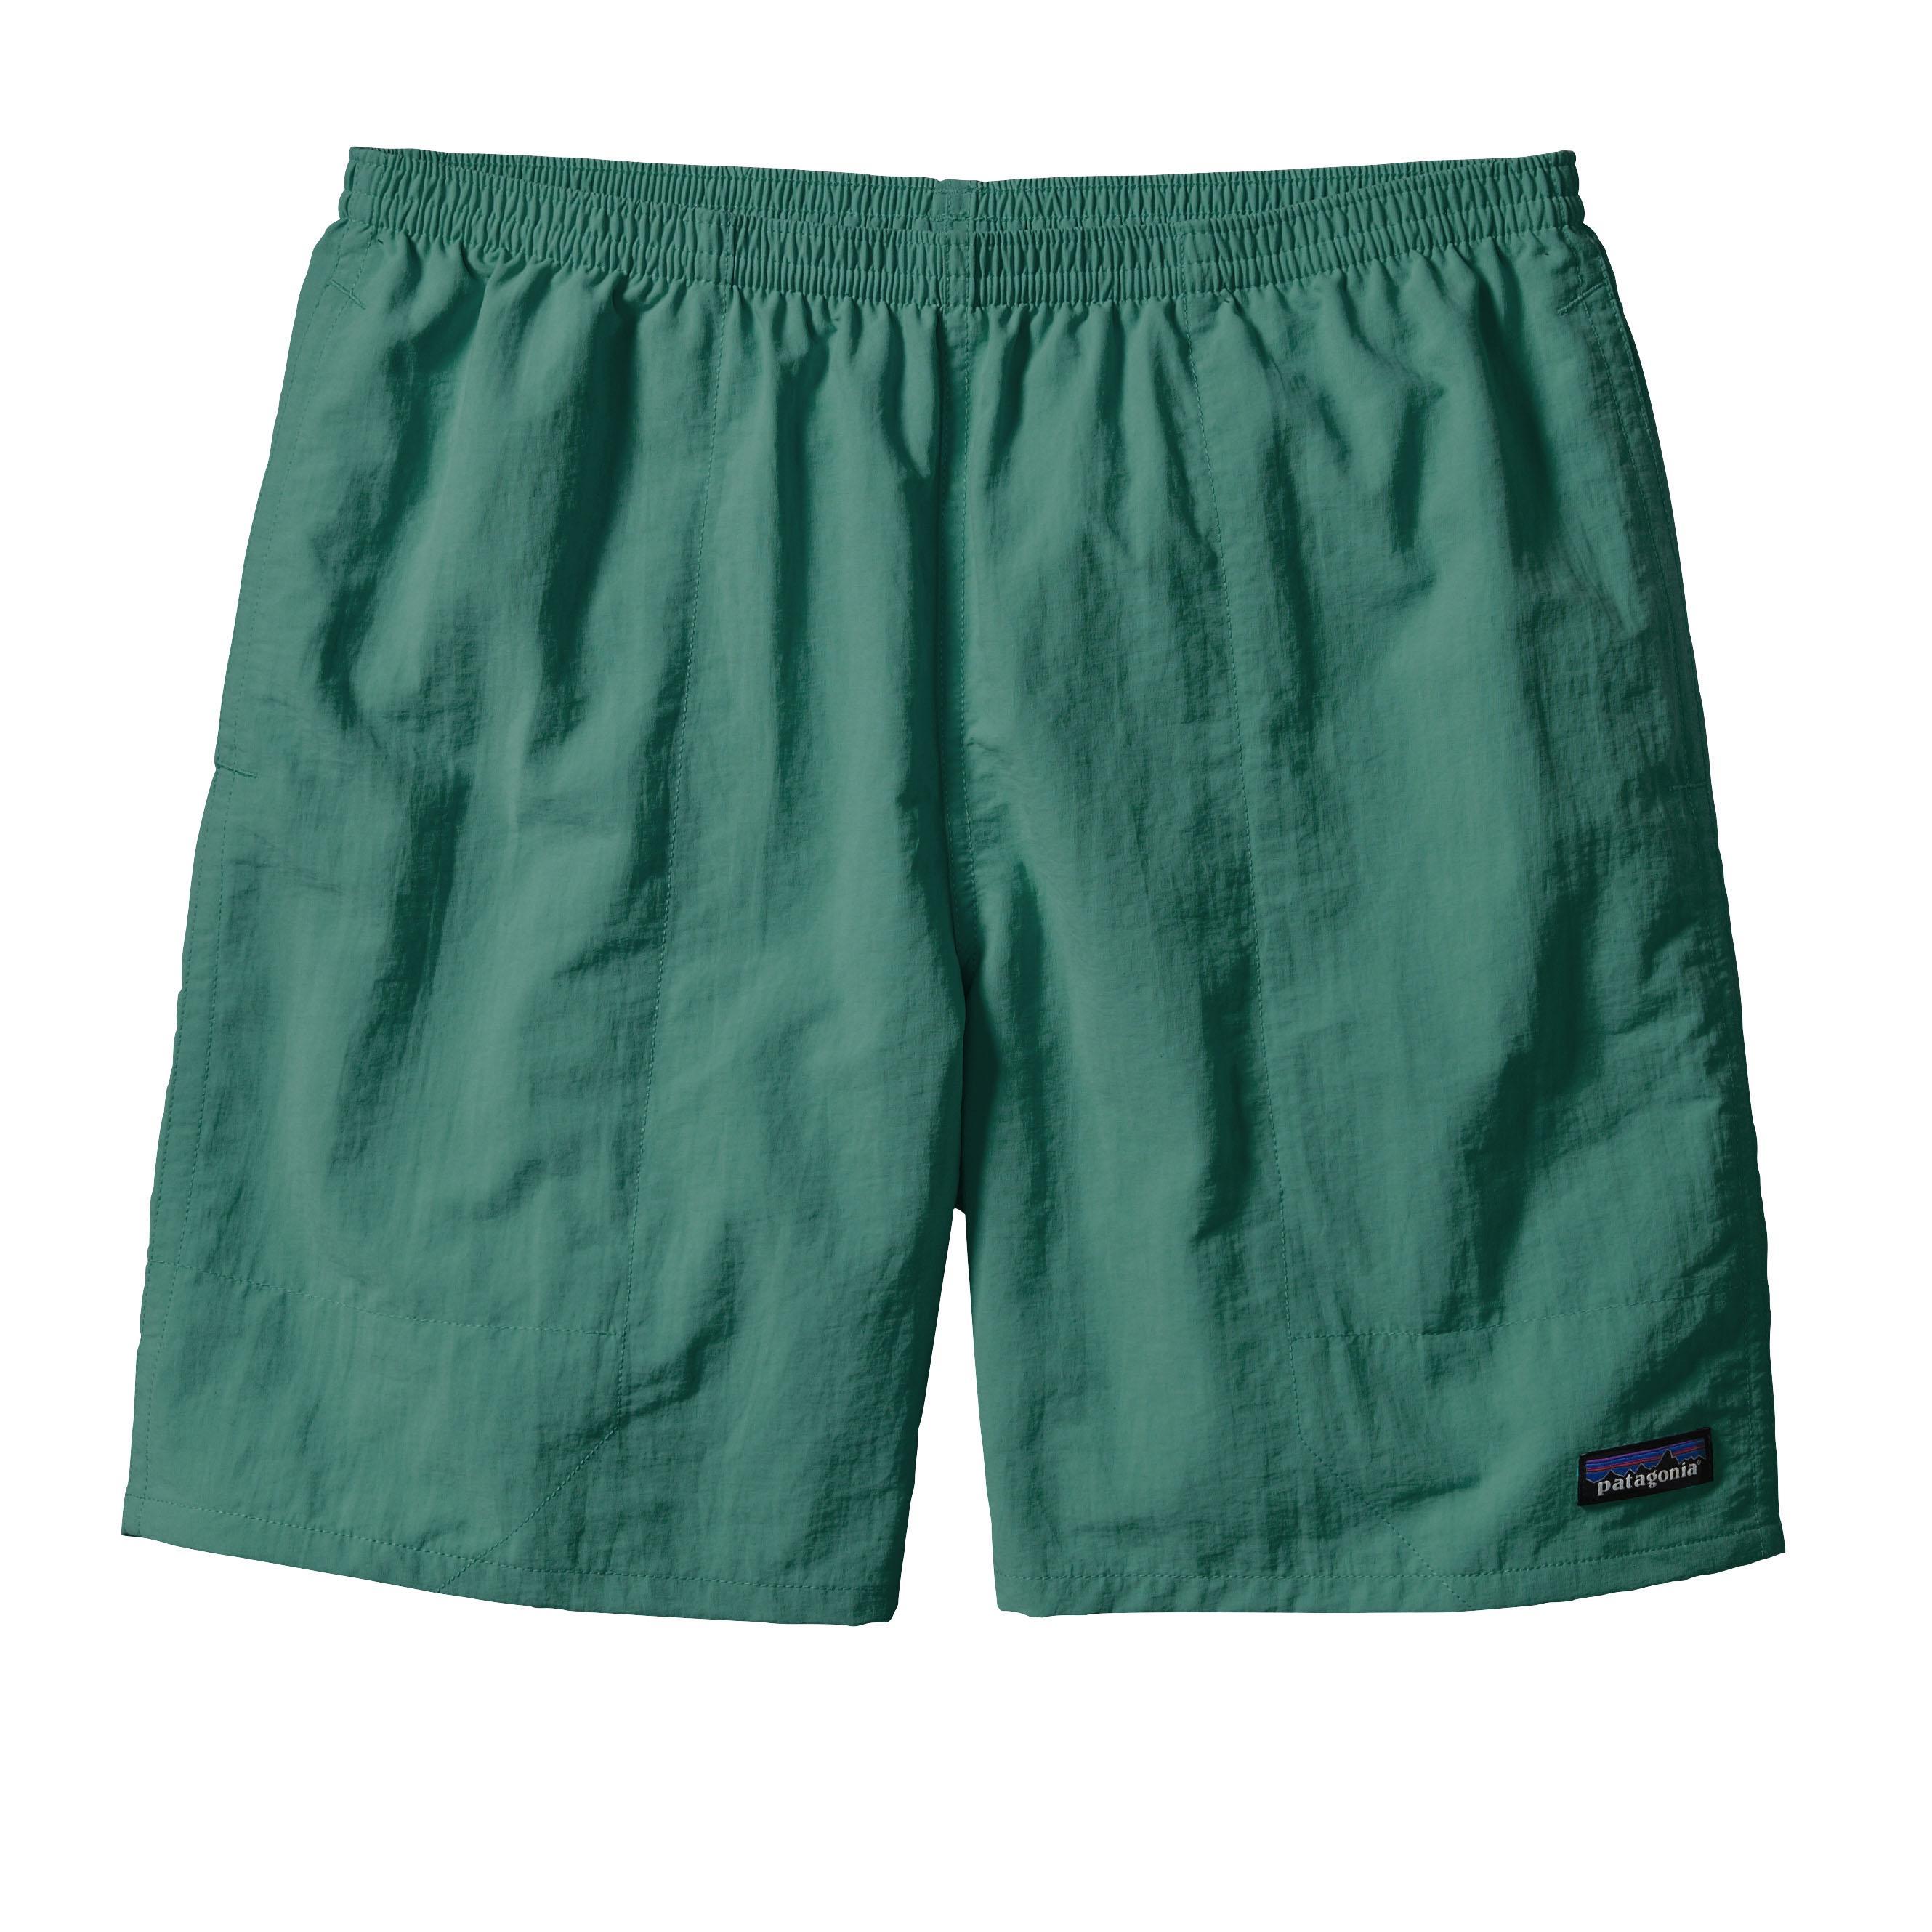 Patagonia Men's Baggies Shorts 7in Inseam GEMG_GREEN